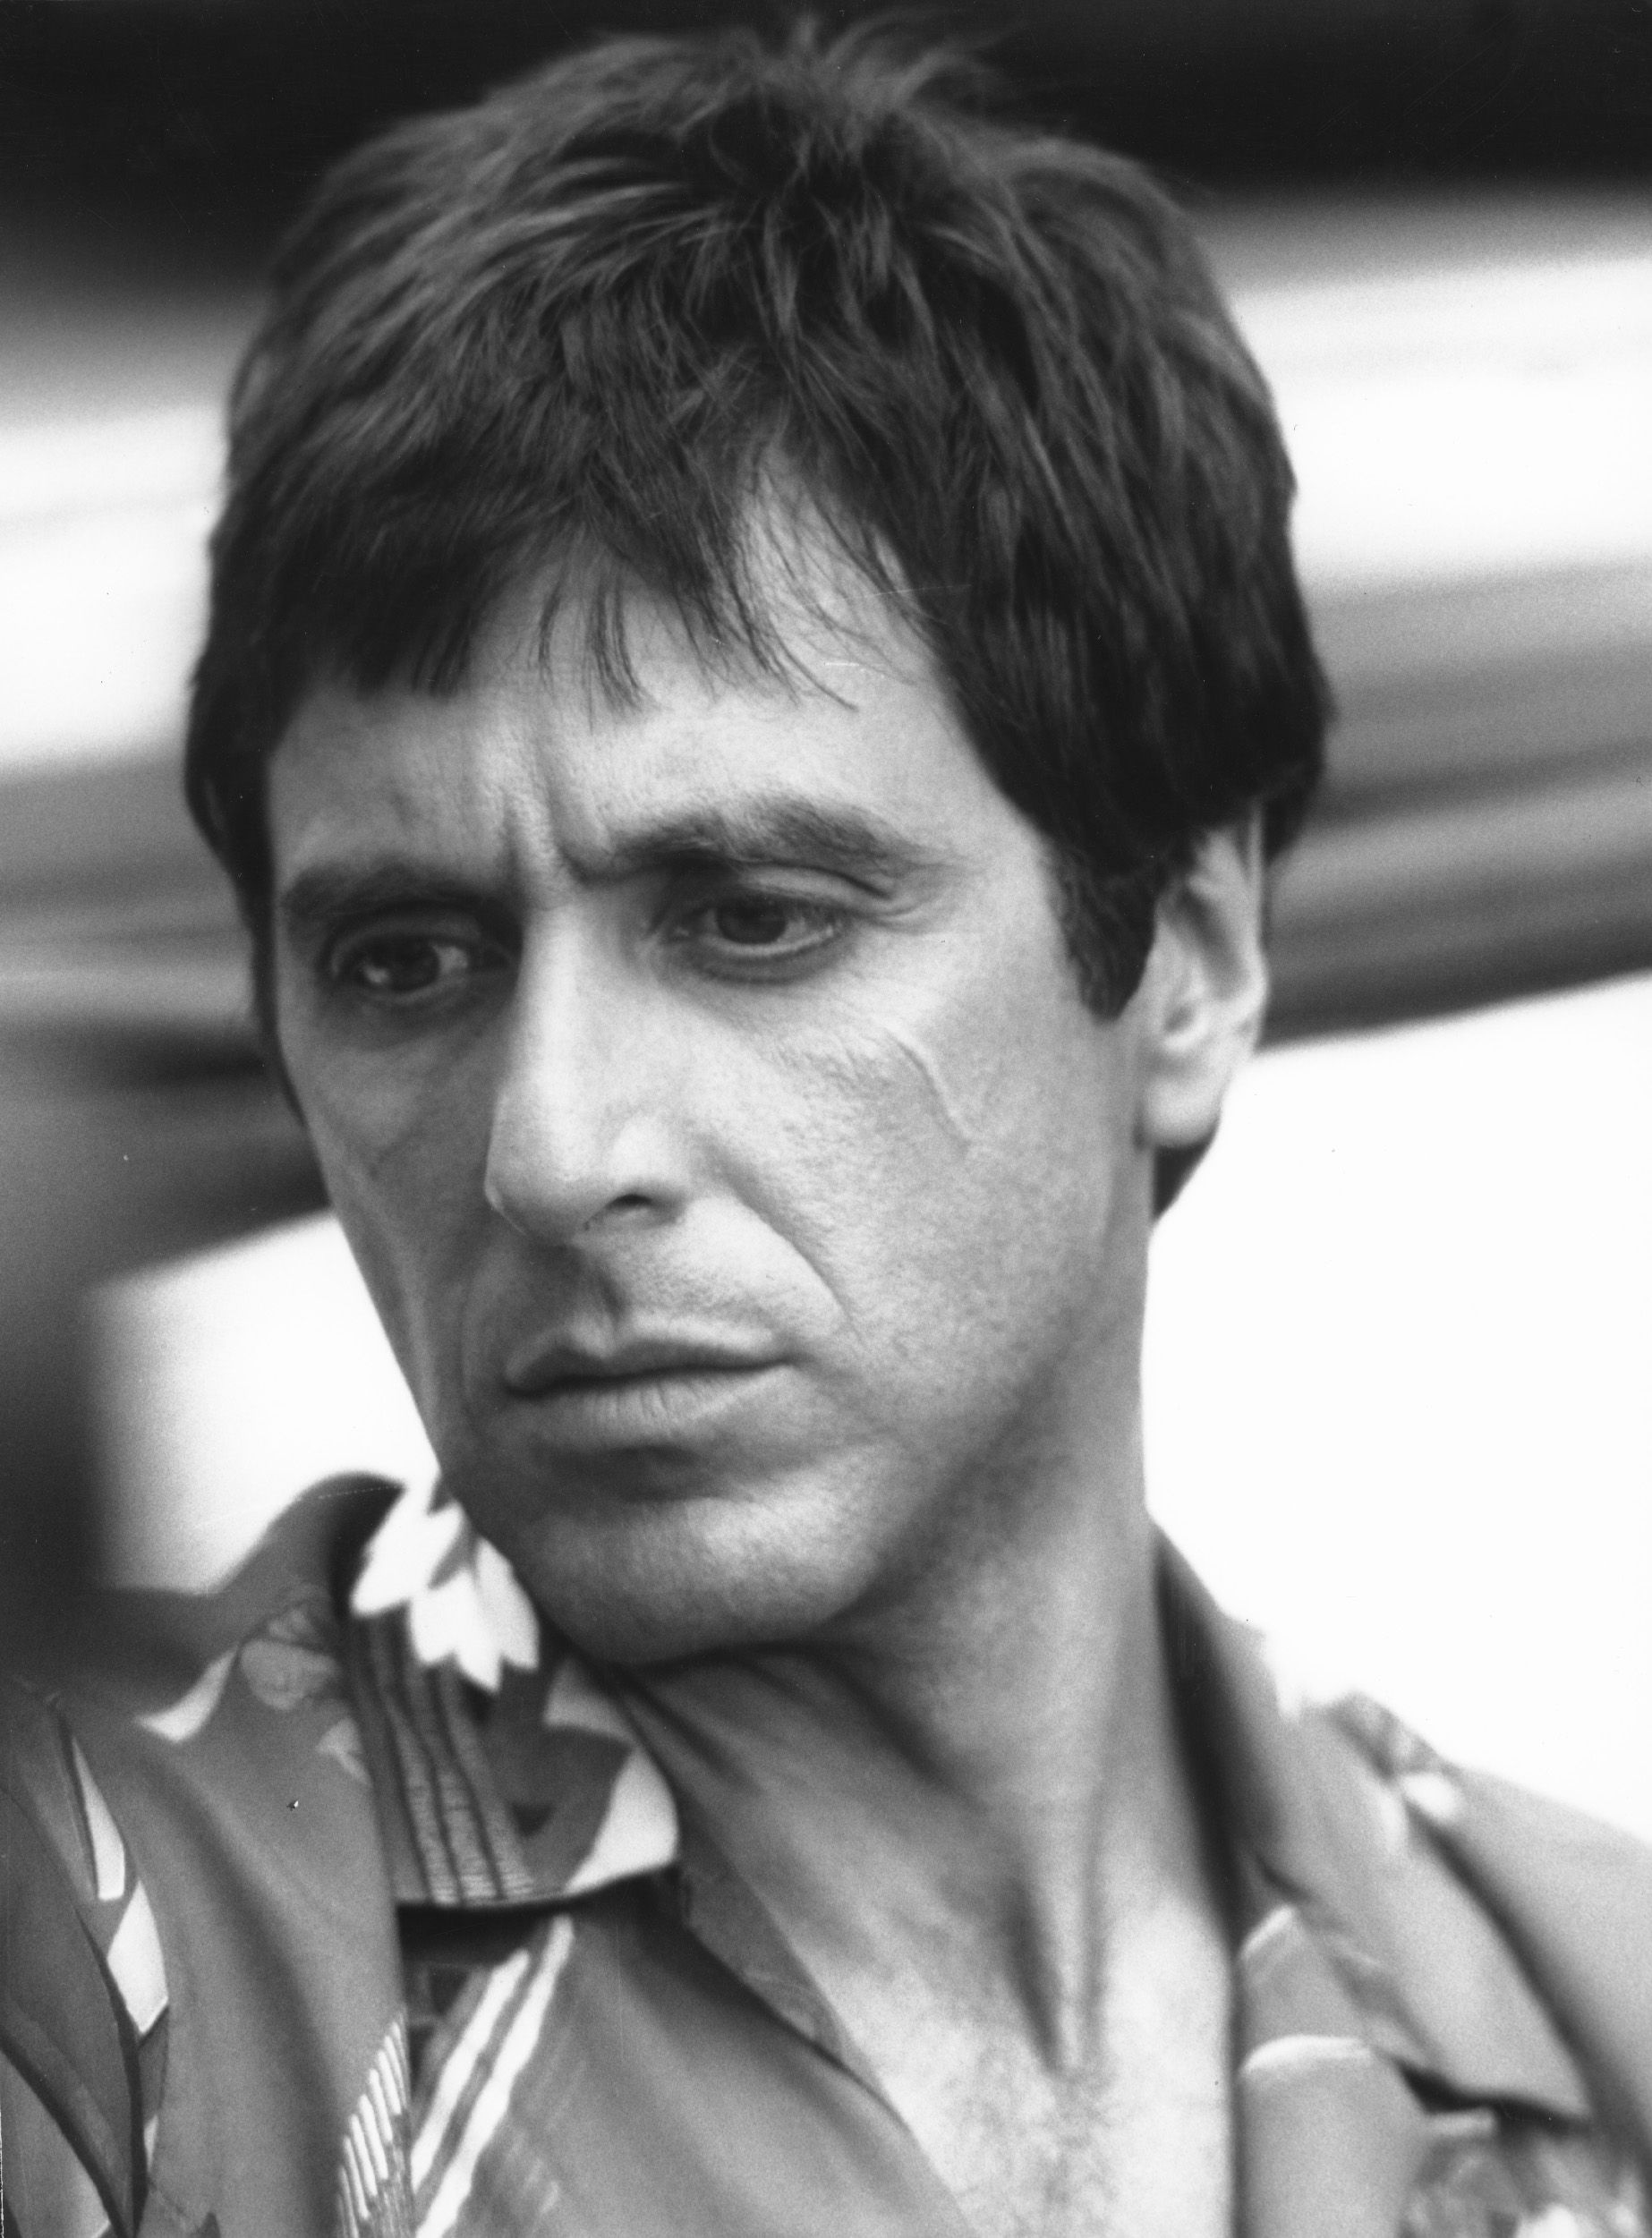 Al Pacino Sweet Celebs/Iconic Stars Pinterest